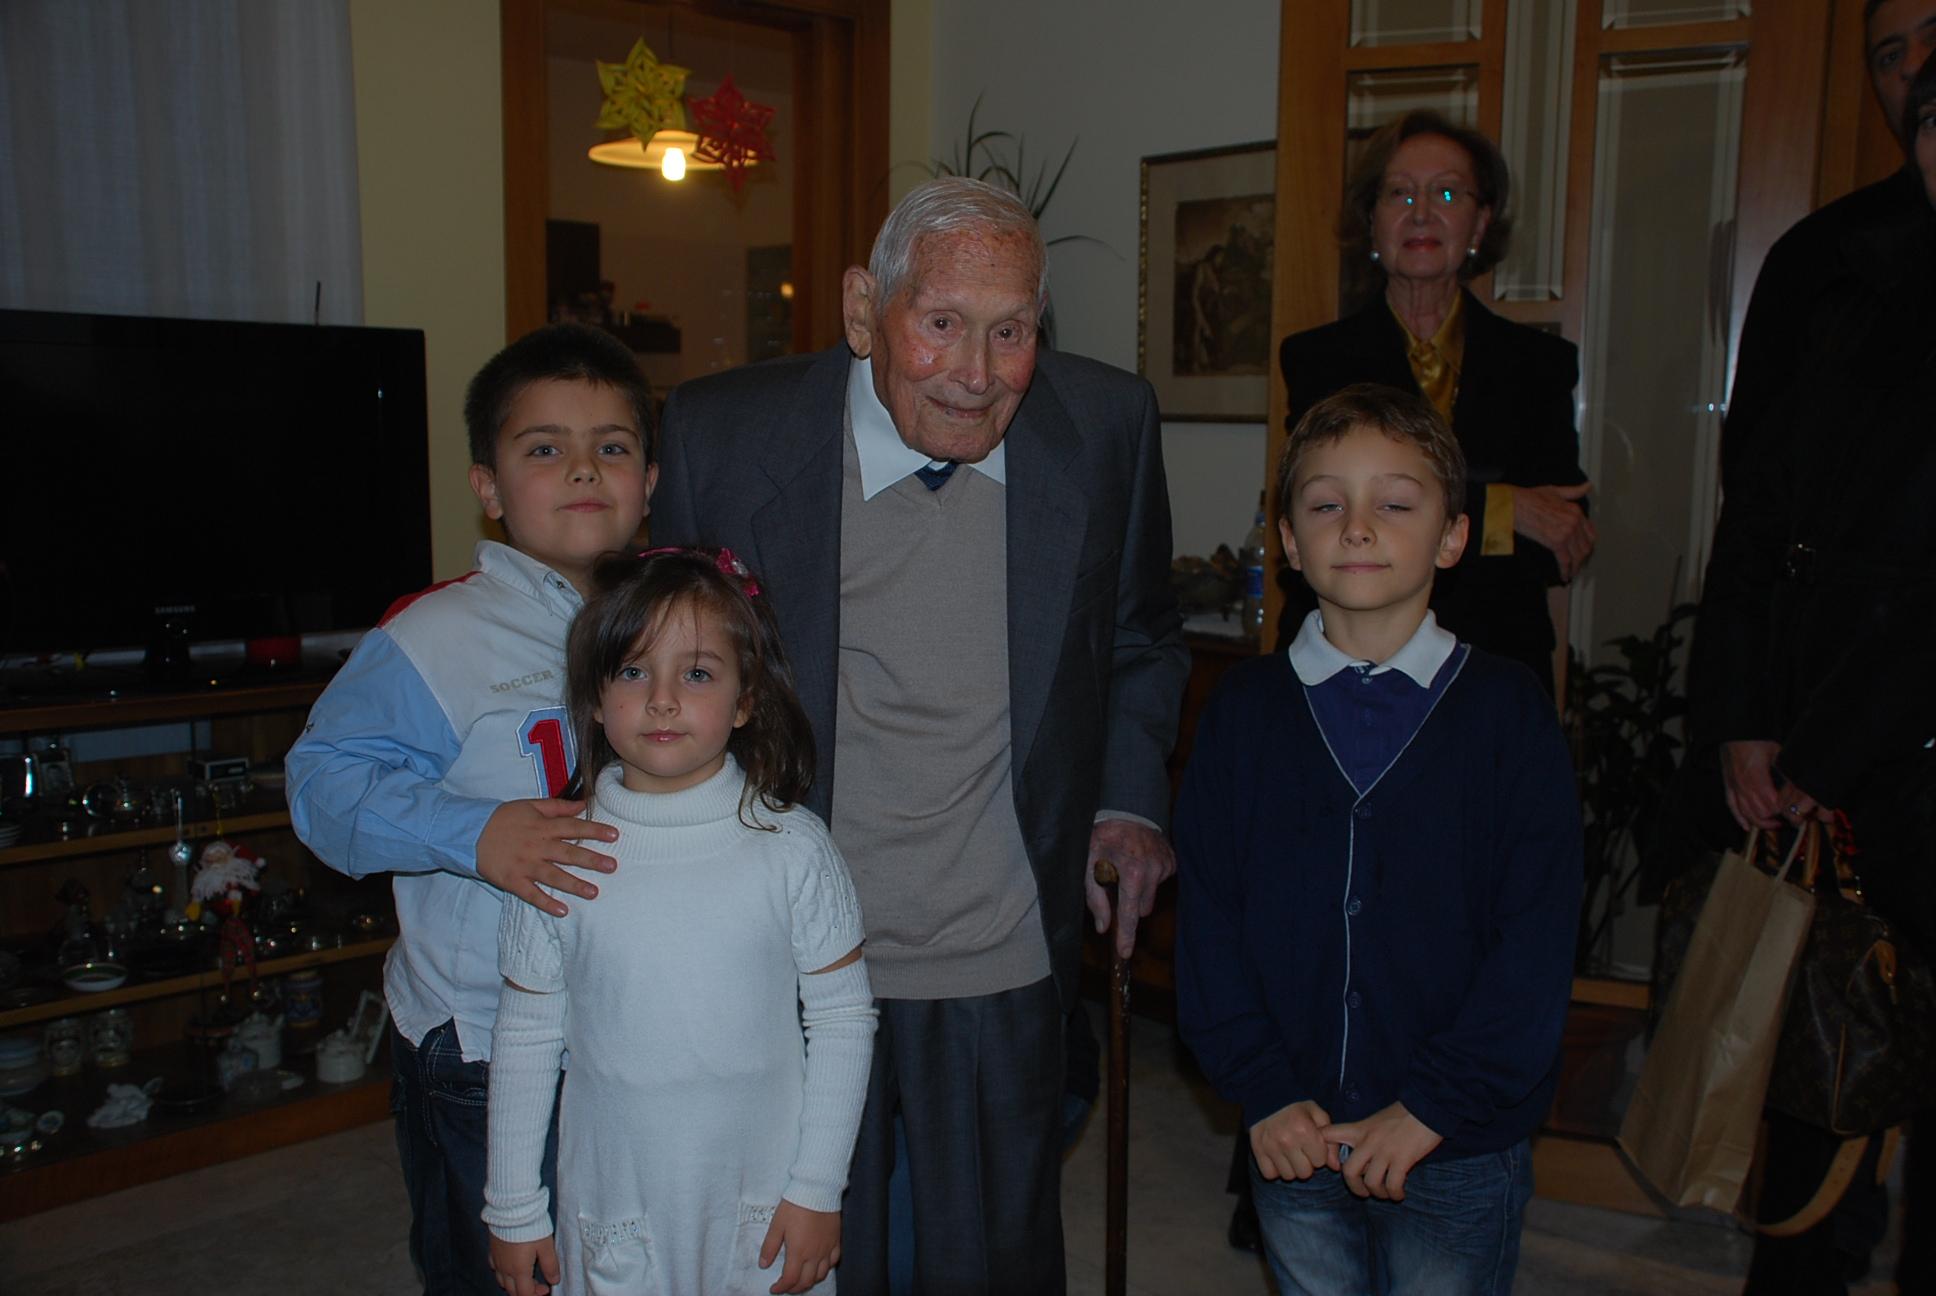 Pasquale Cianci